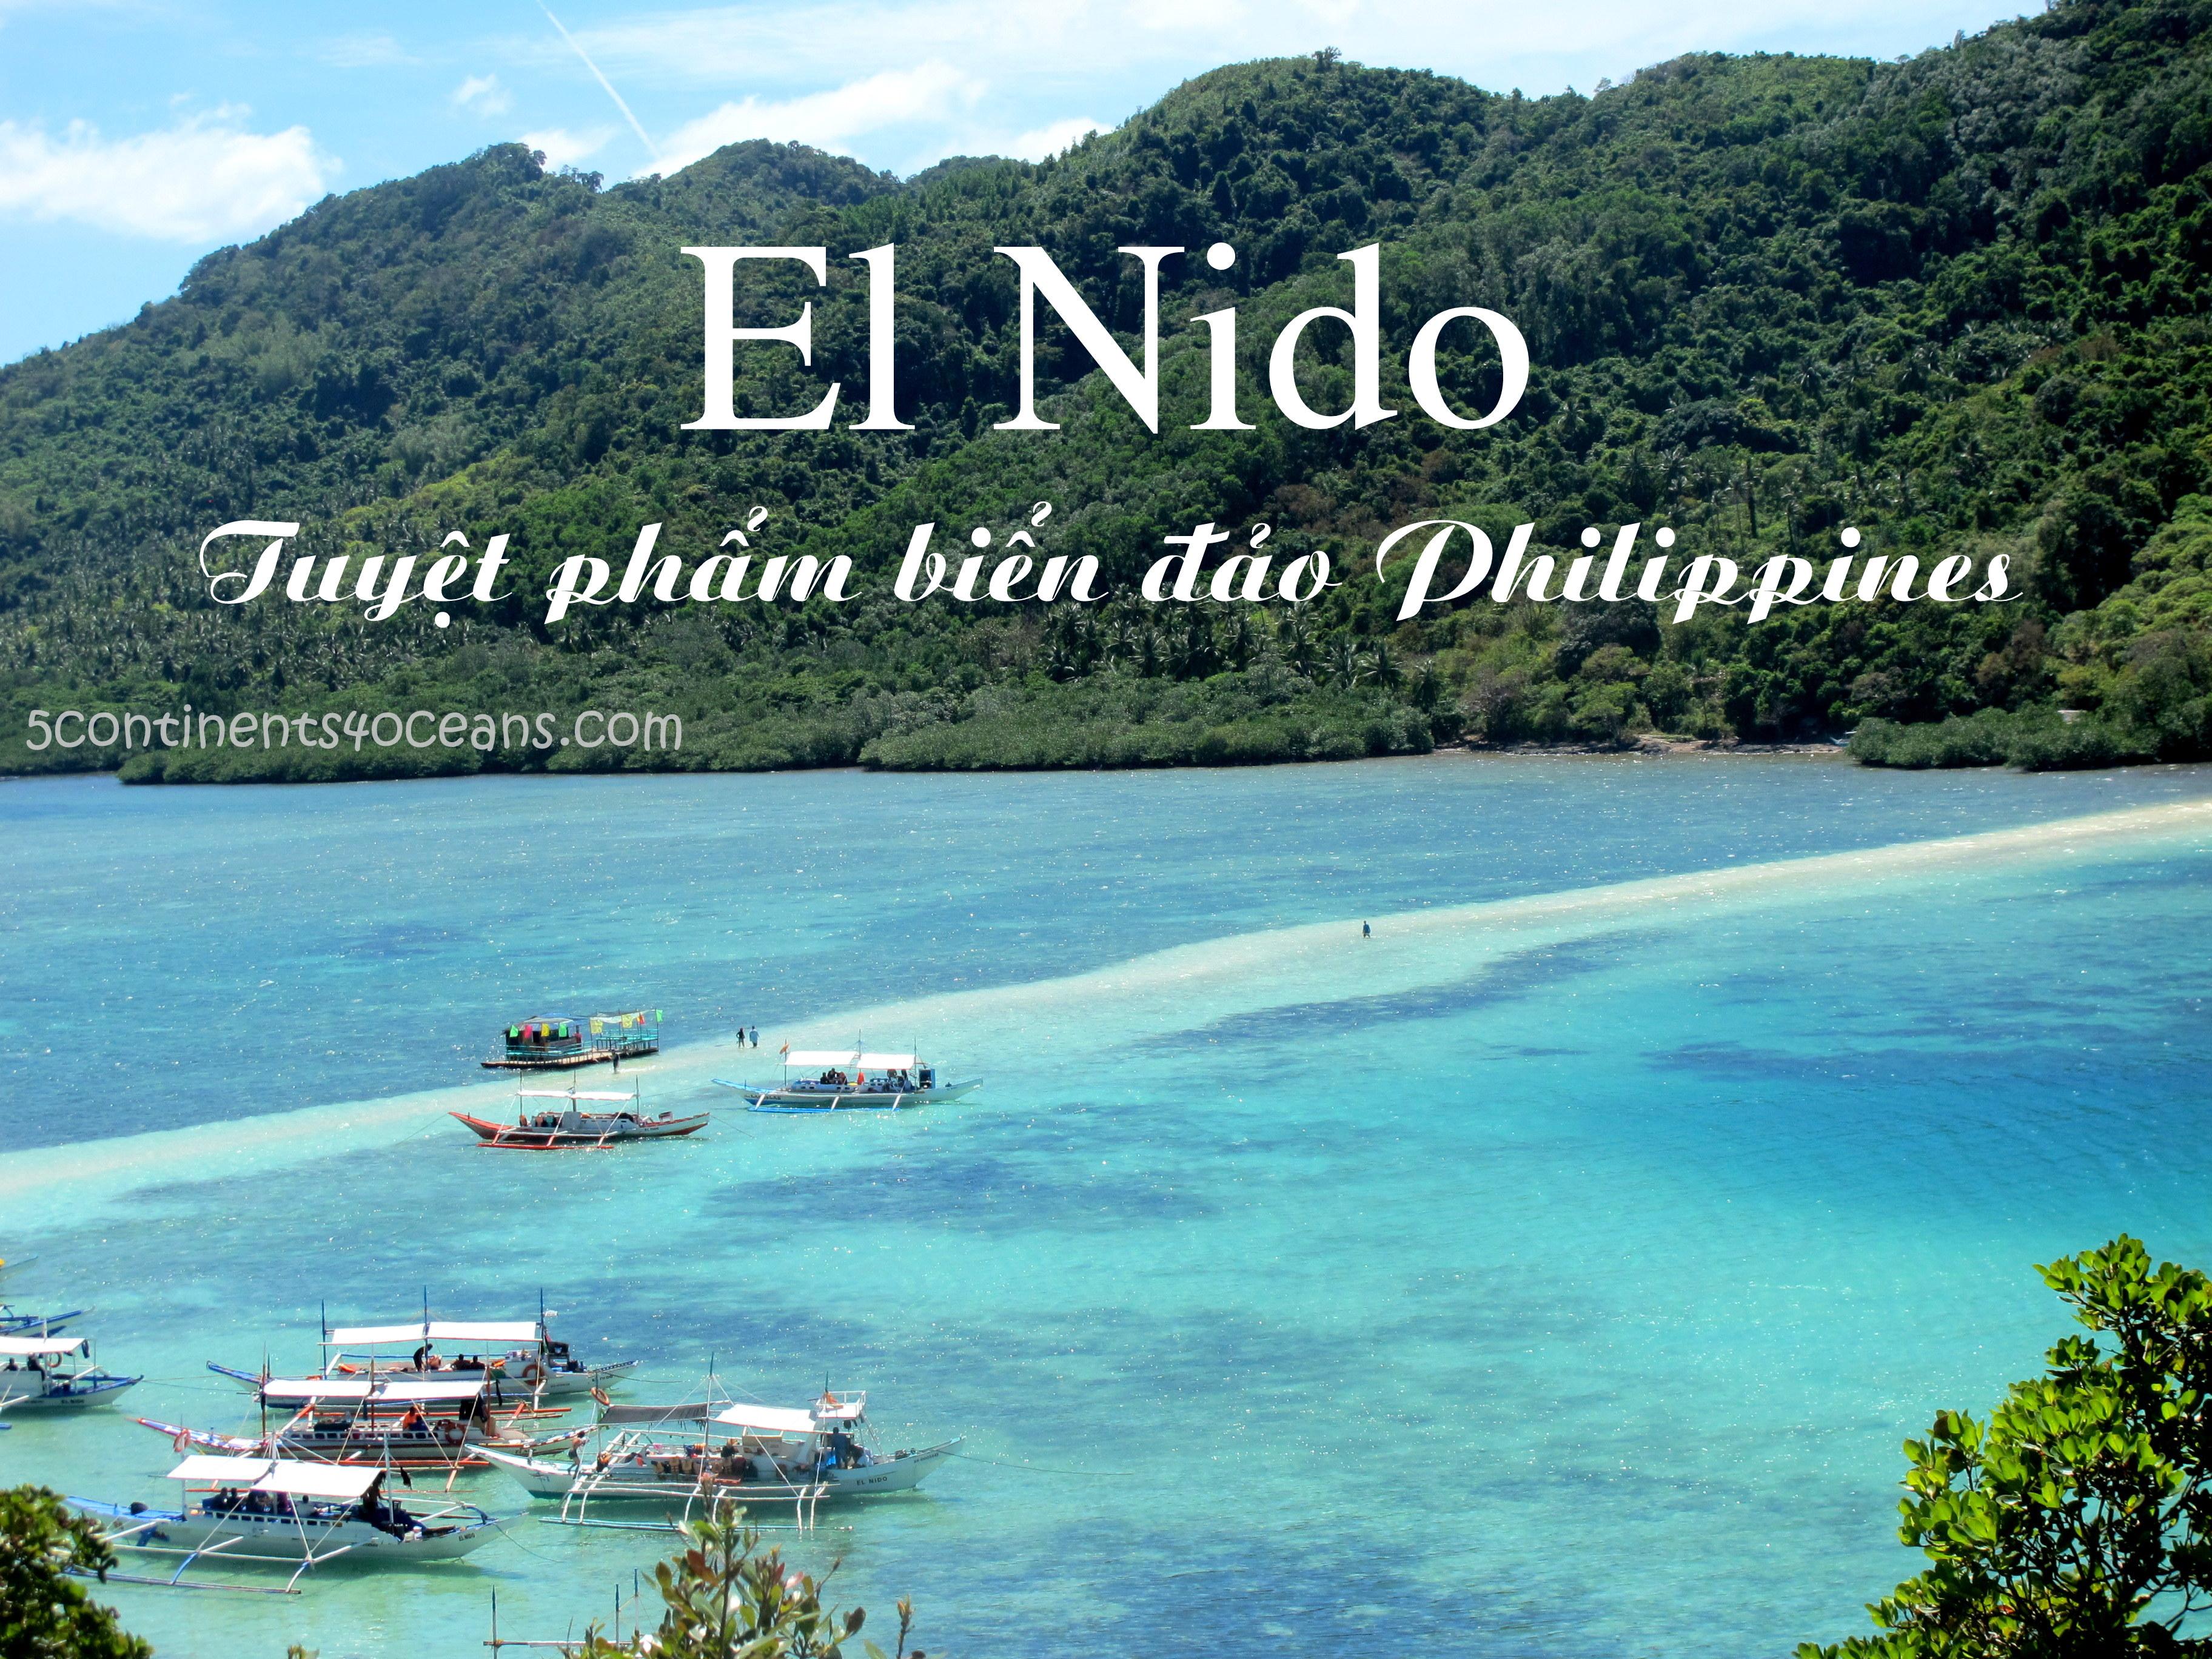 El Nido – Tuyệt phẩm biển đảo Philippines